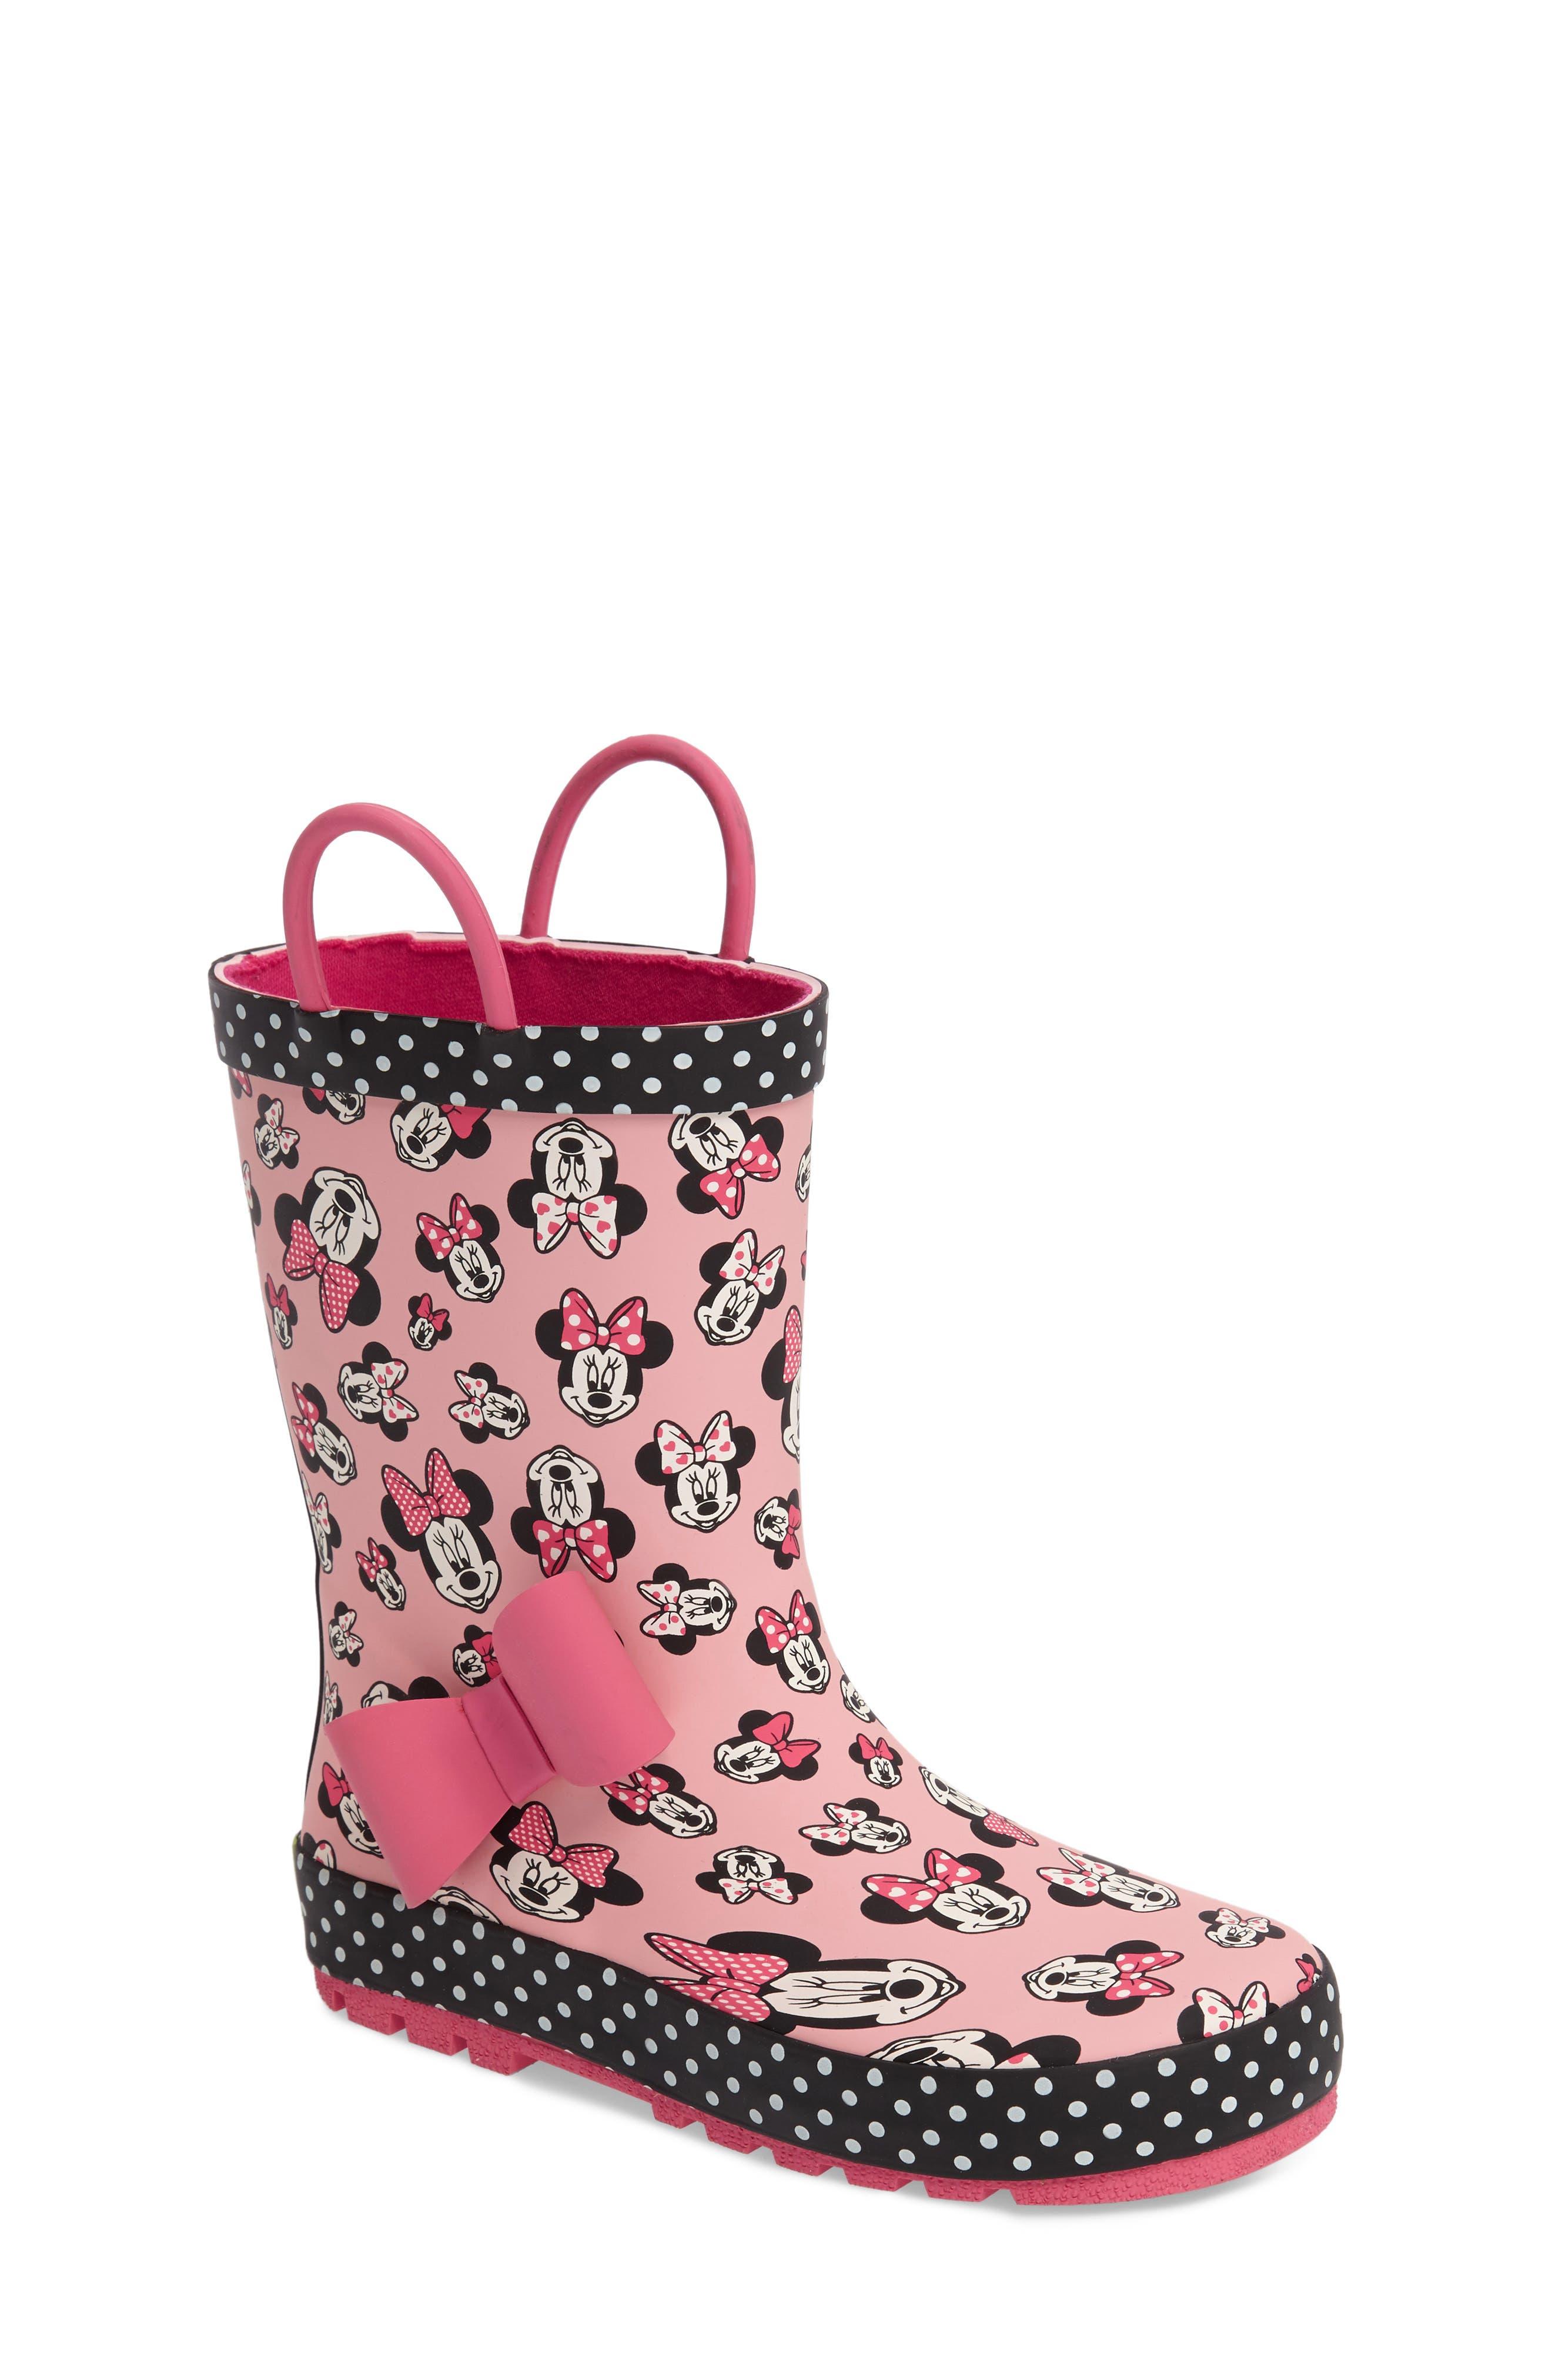 Disney<sup>®</sup> Minnie Mouse Waterproof Rain Boot,                         Main,                         color, 680